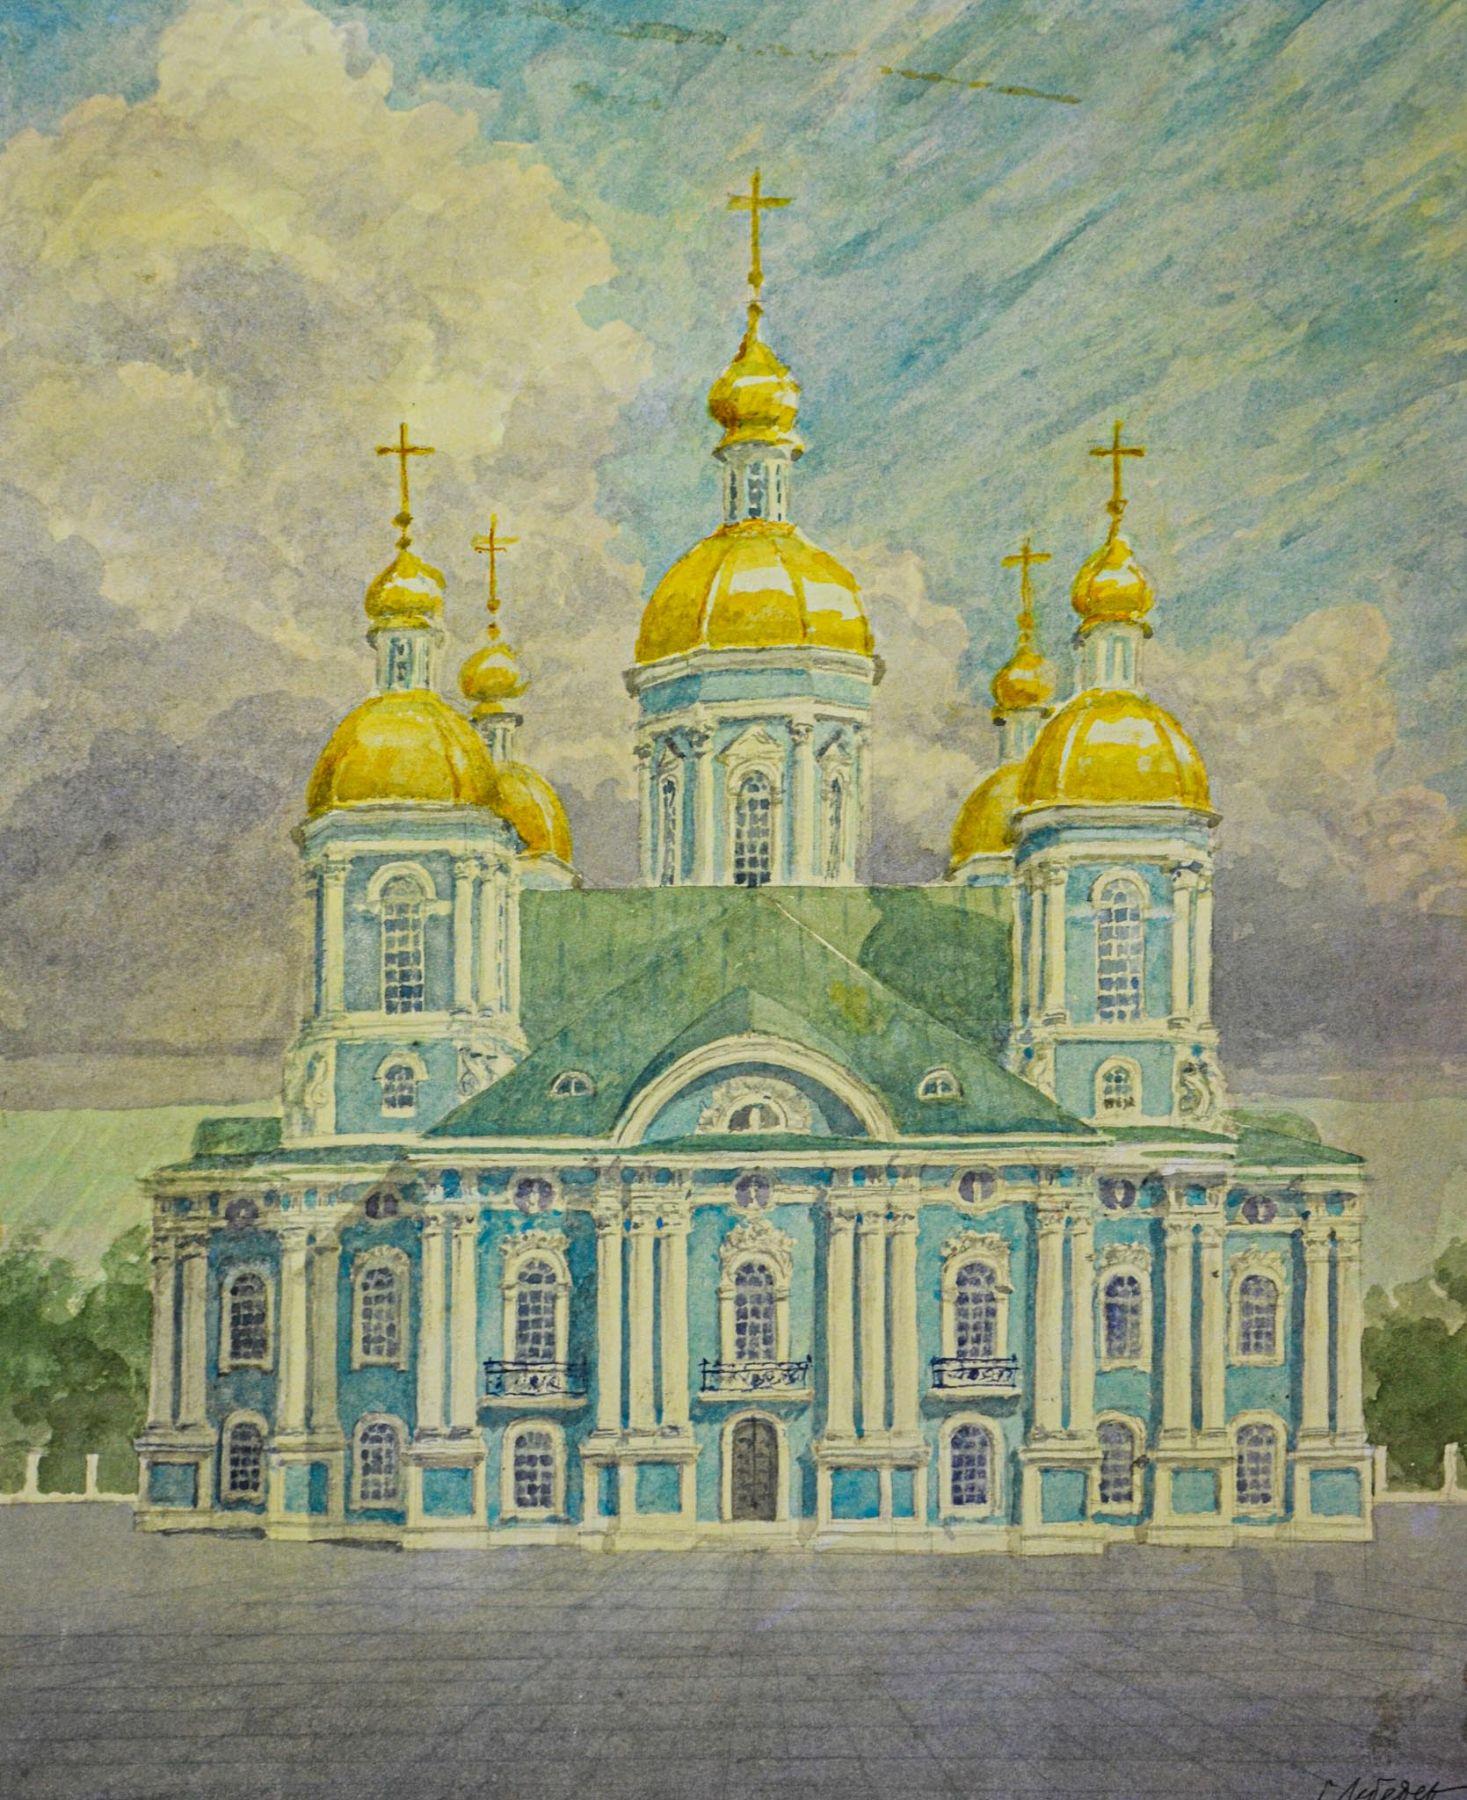 Санкт-Петербург. Вид Николаевского военно-морского собора.